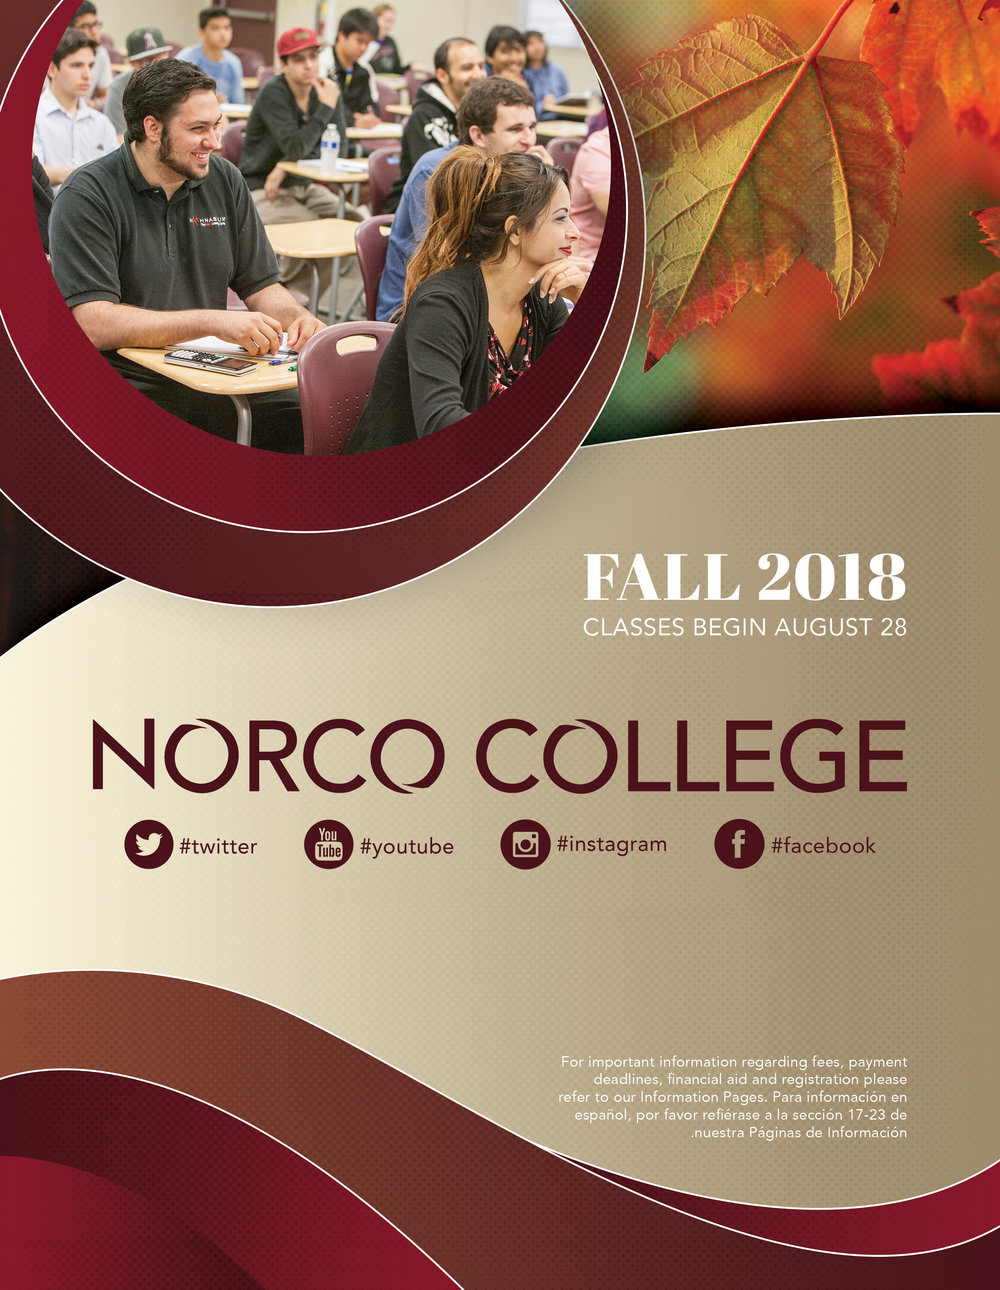 Schedule of Classes - Fall 2018.jpg